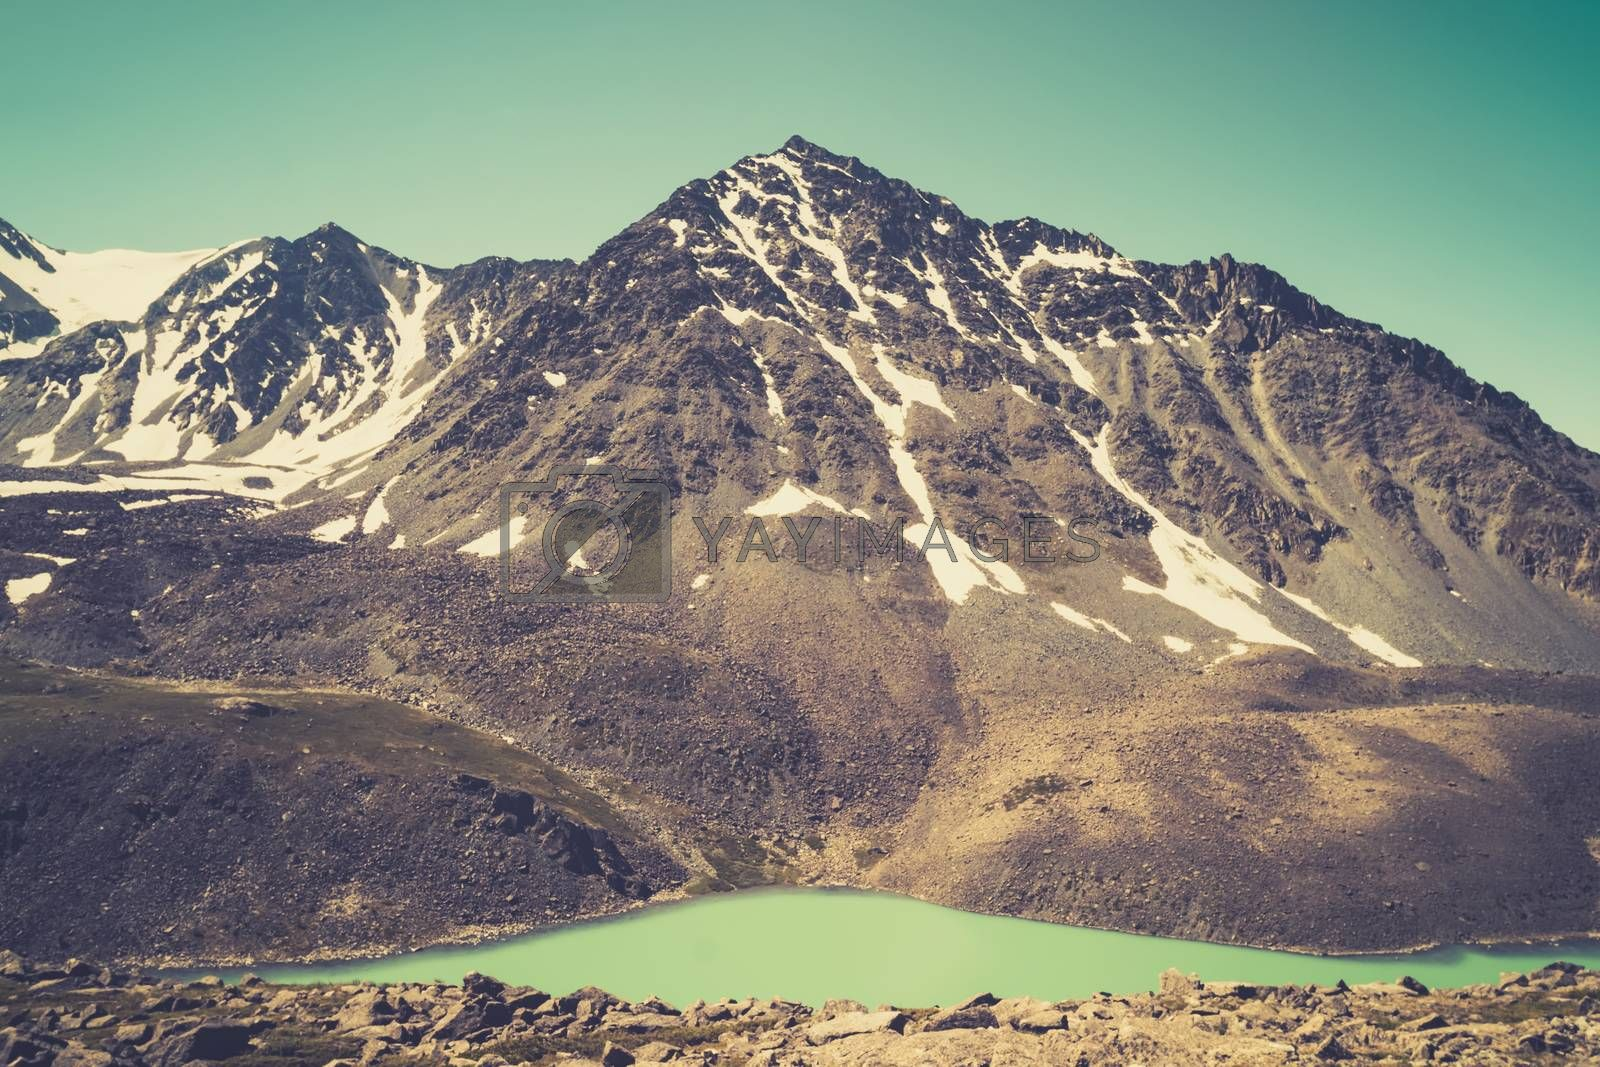 Royalty free image of Beautiful panoramic view at Kucherla mountain lake and mountain range. Belukha national park, Altai republic, Siberia, Russia. Lake green and lake blue above lake Kucherla by diy13